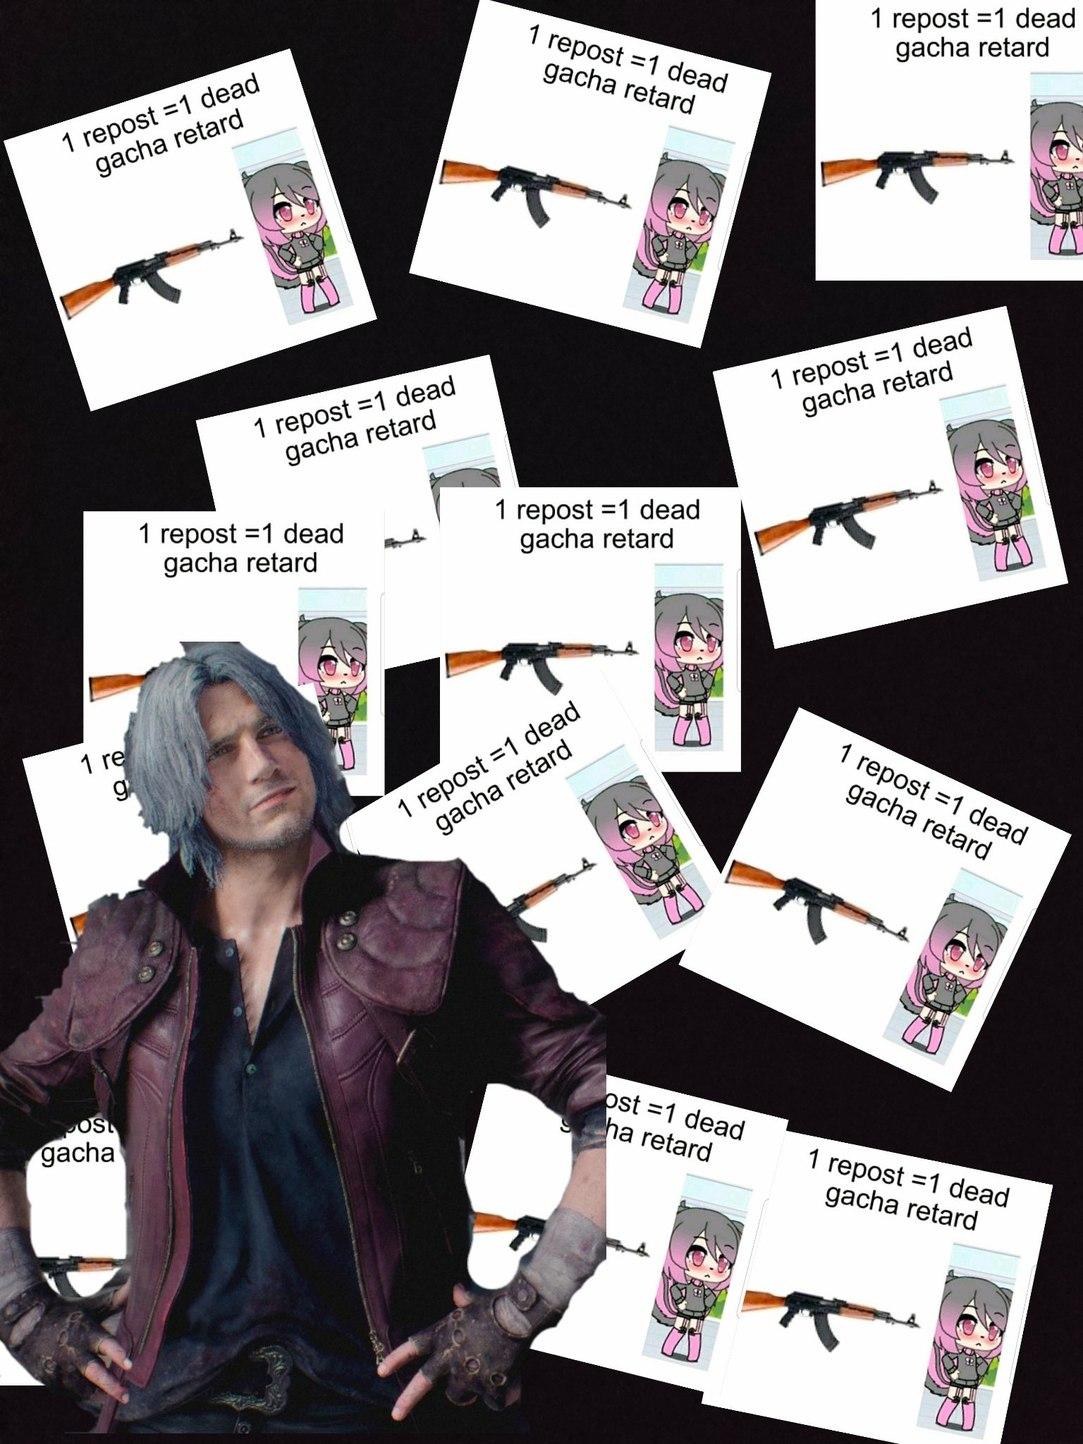 Dante Capo - meme